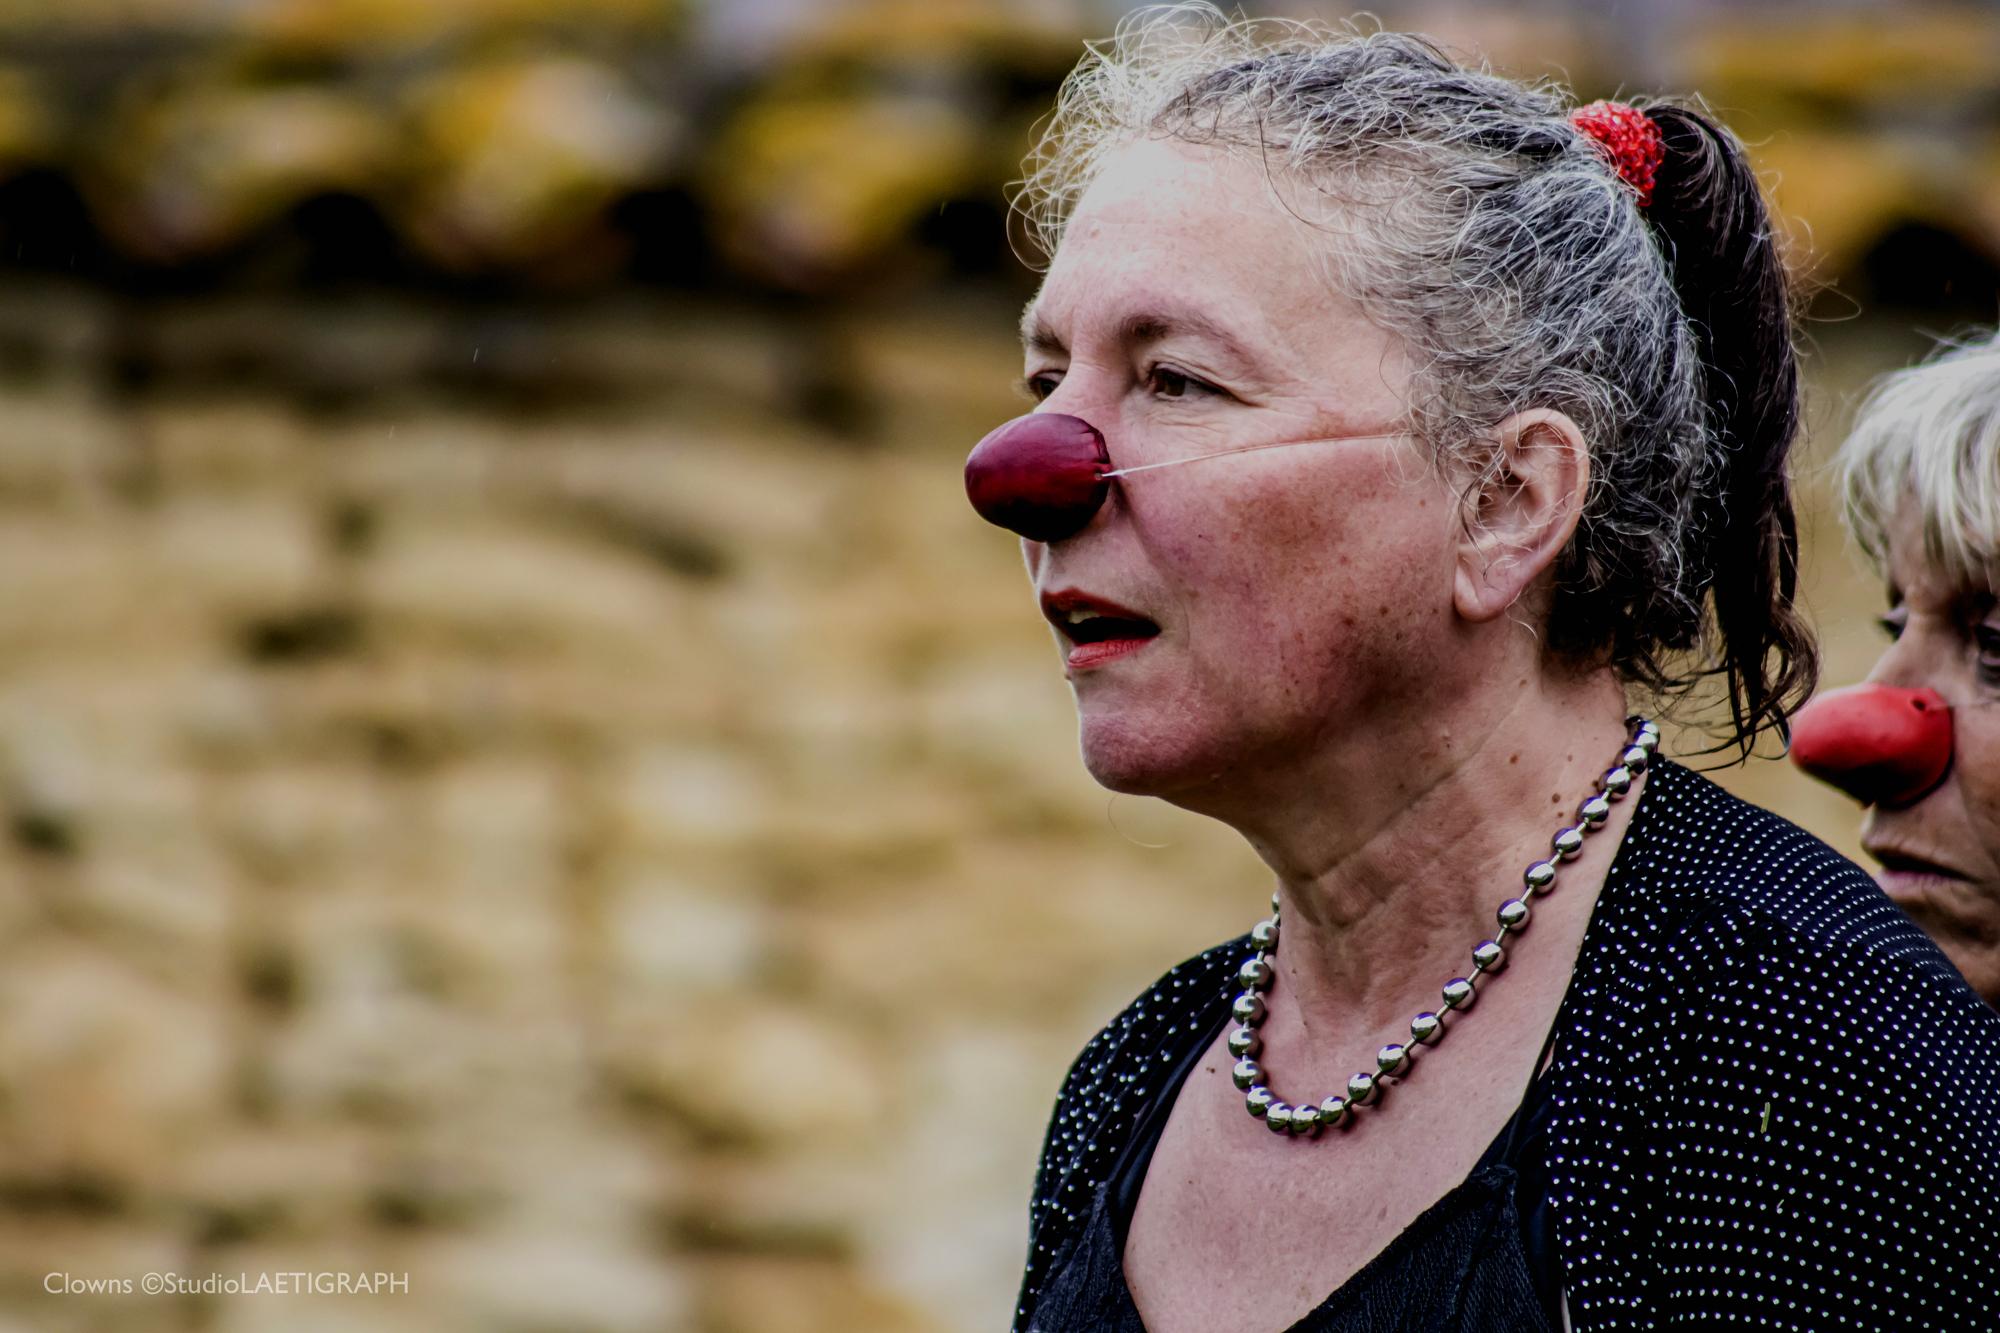 LMDCB21_clowns-133_1